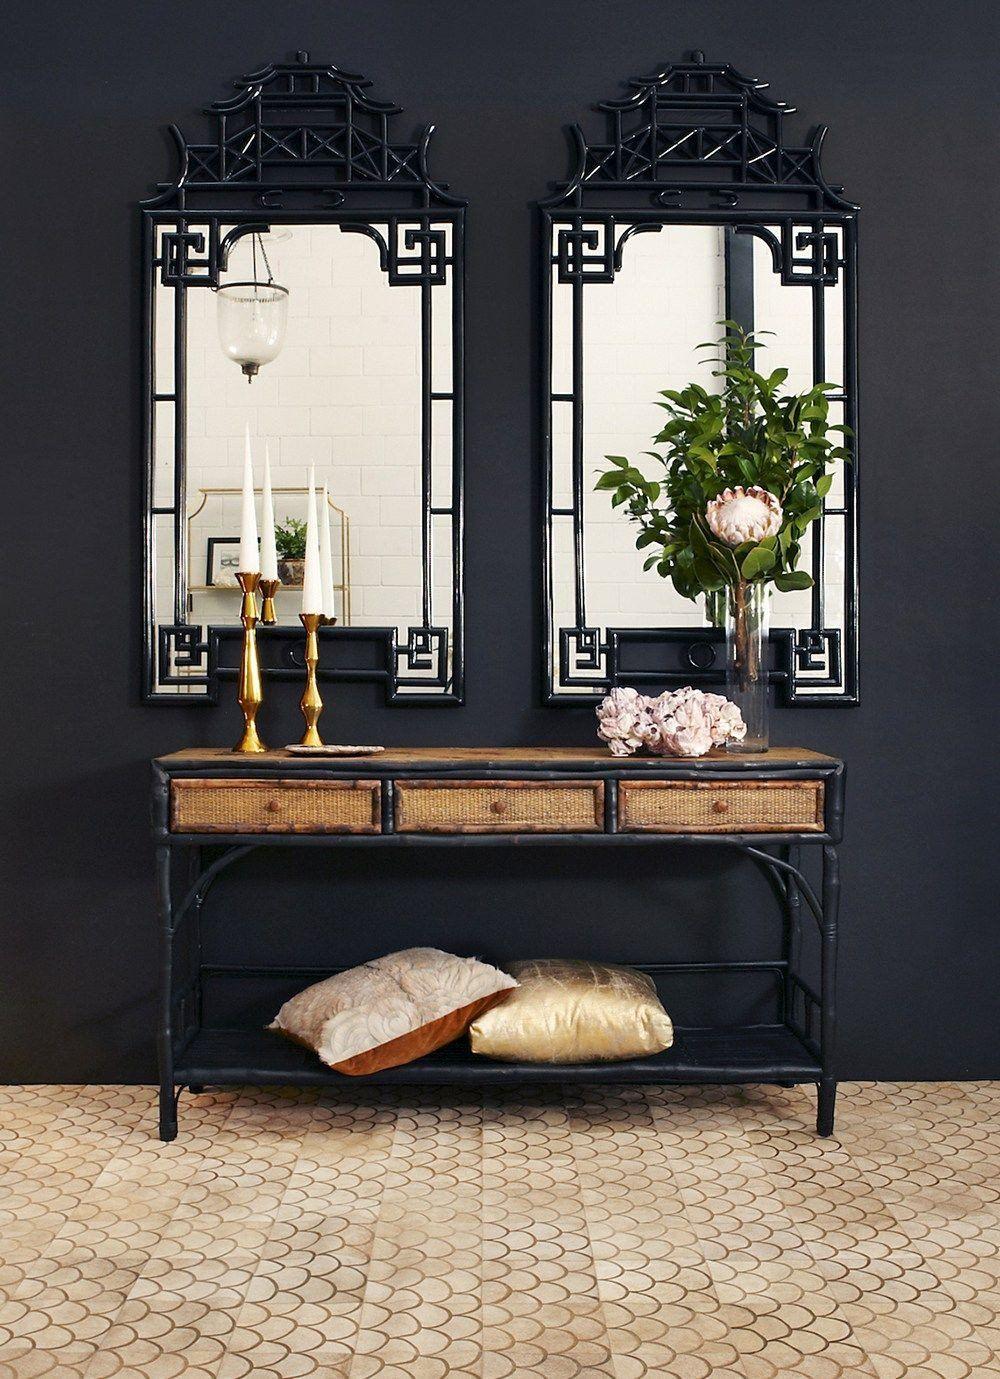 Asian Decoration Ideas Inspirational March Moodboard Black Rattan